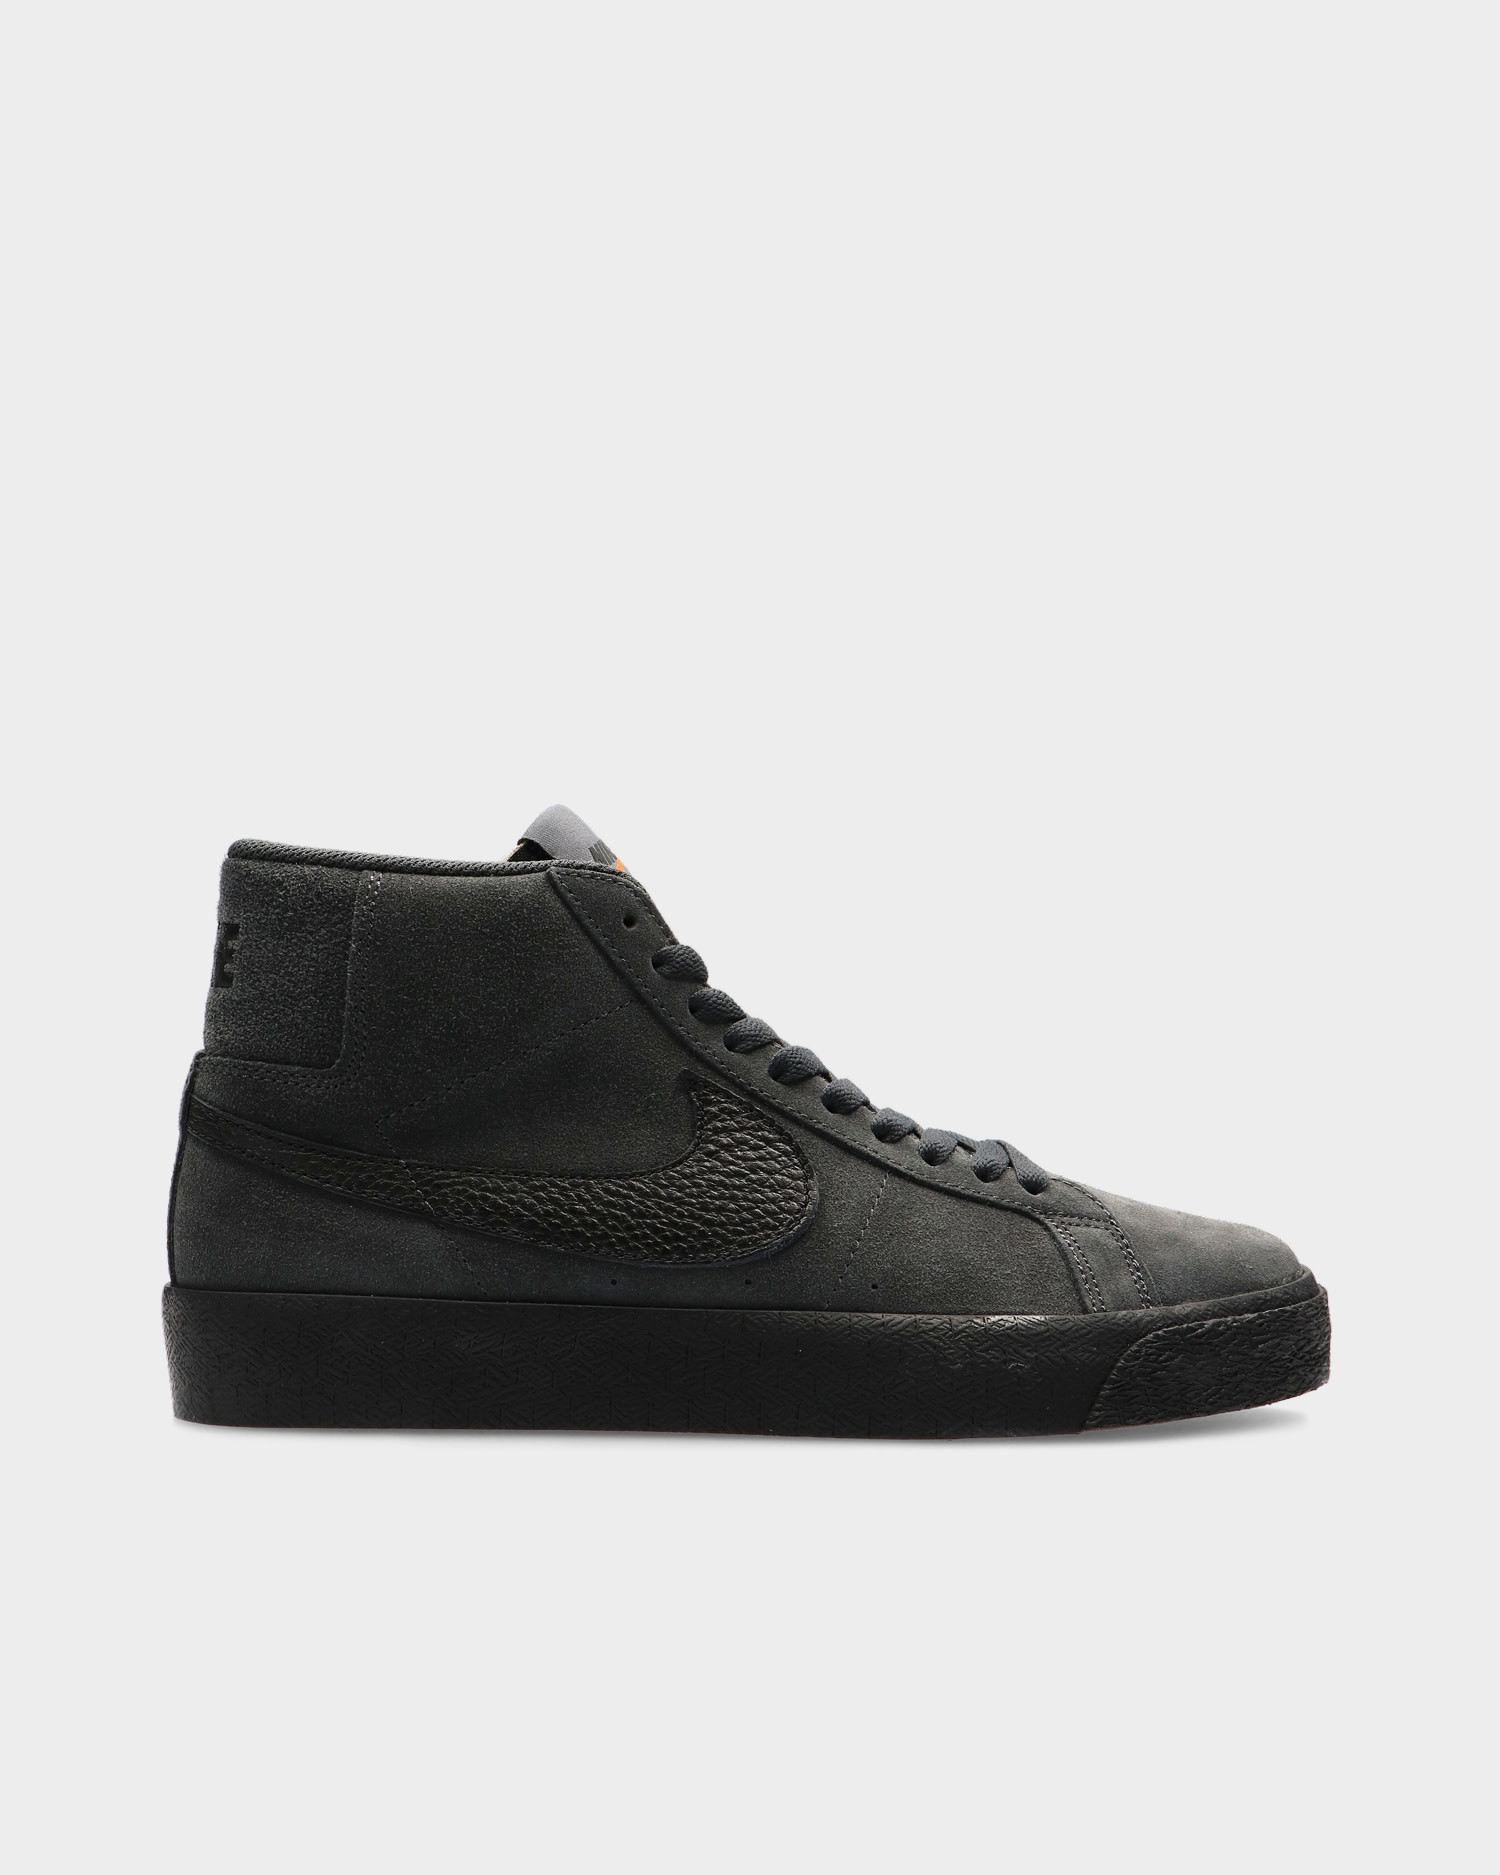 Nike Sb Zoom Blazer Mid Orange Label Iso Dark Smoke Grey/Black-Dark Smoke Gey-Black